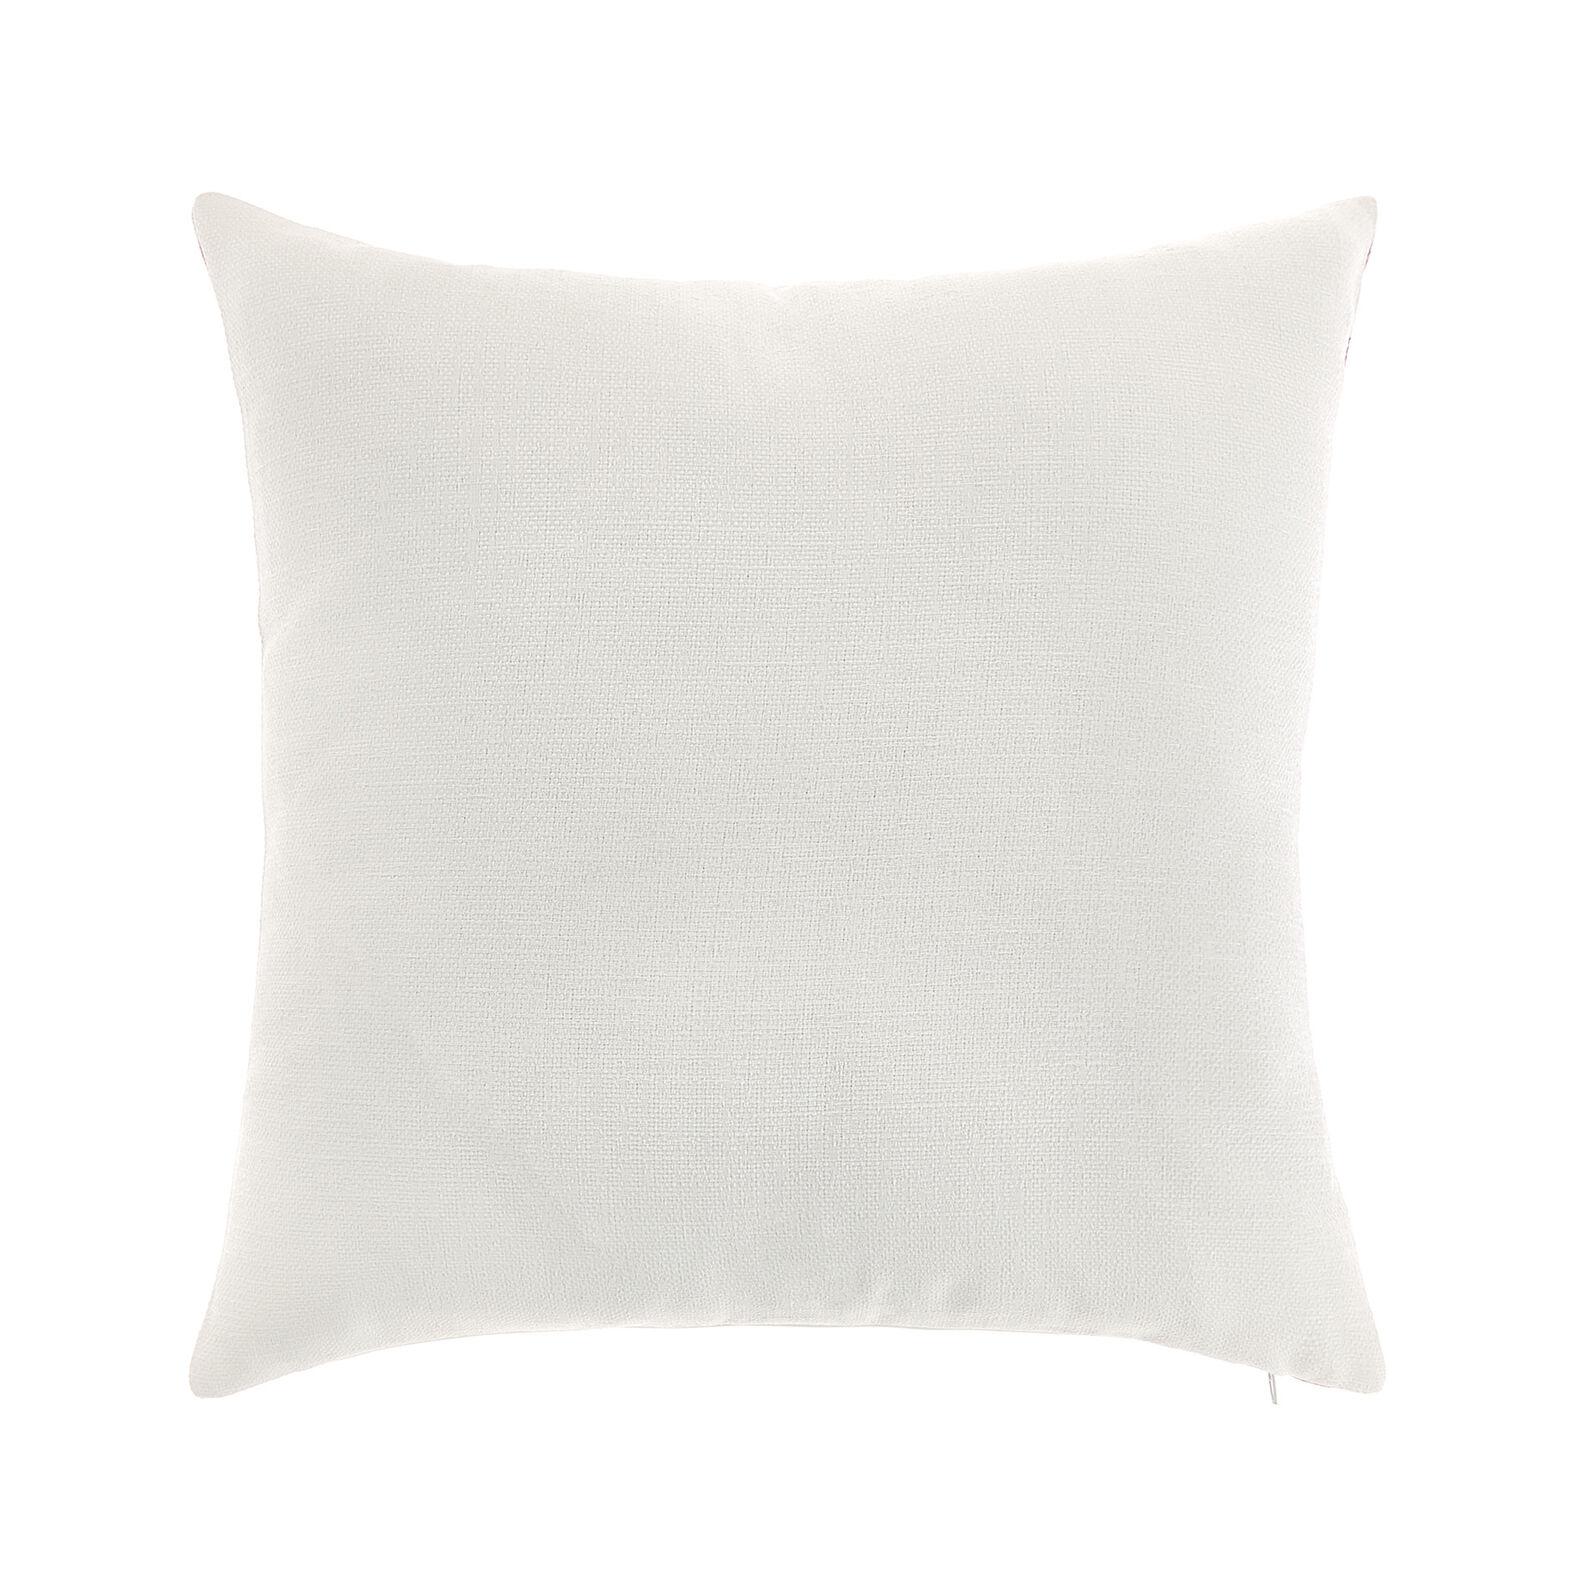 Cushion with digital flowers print